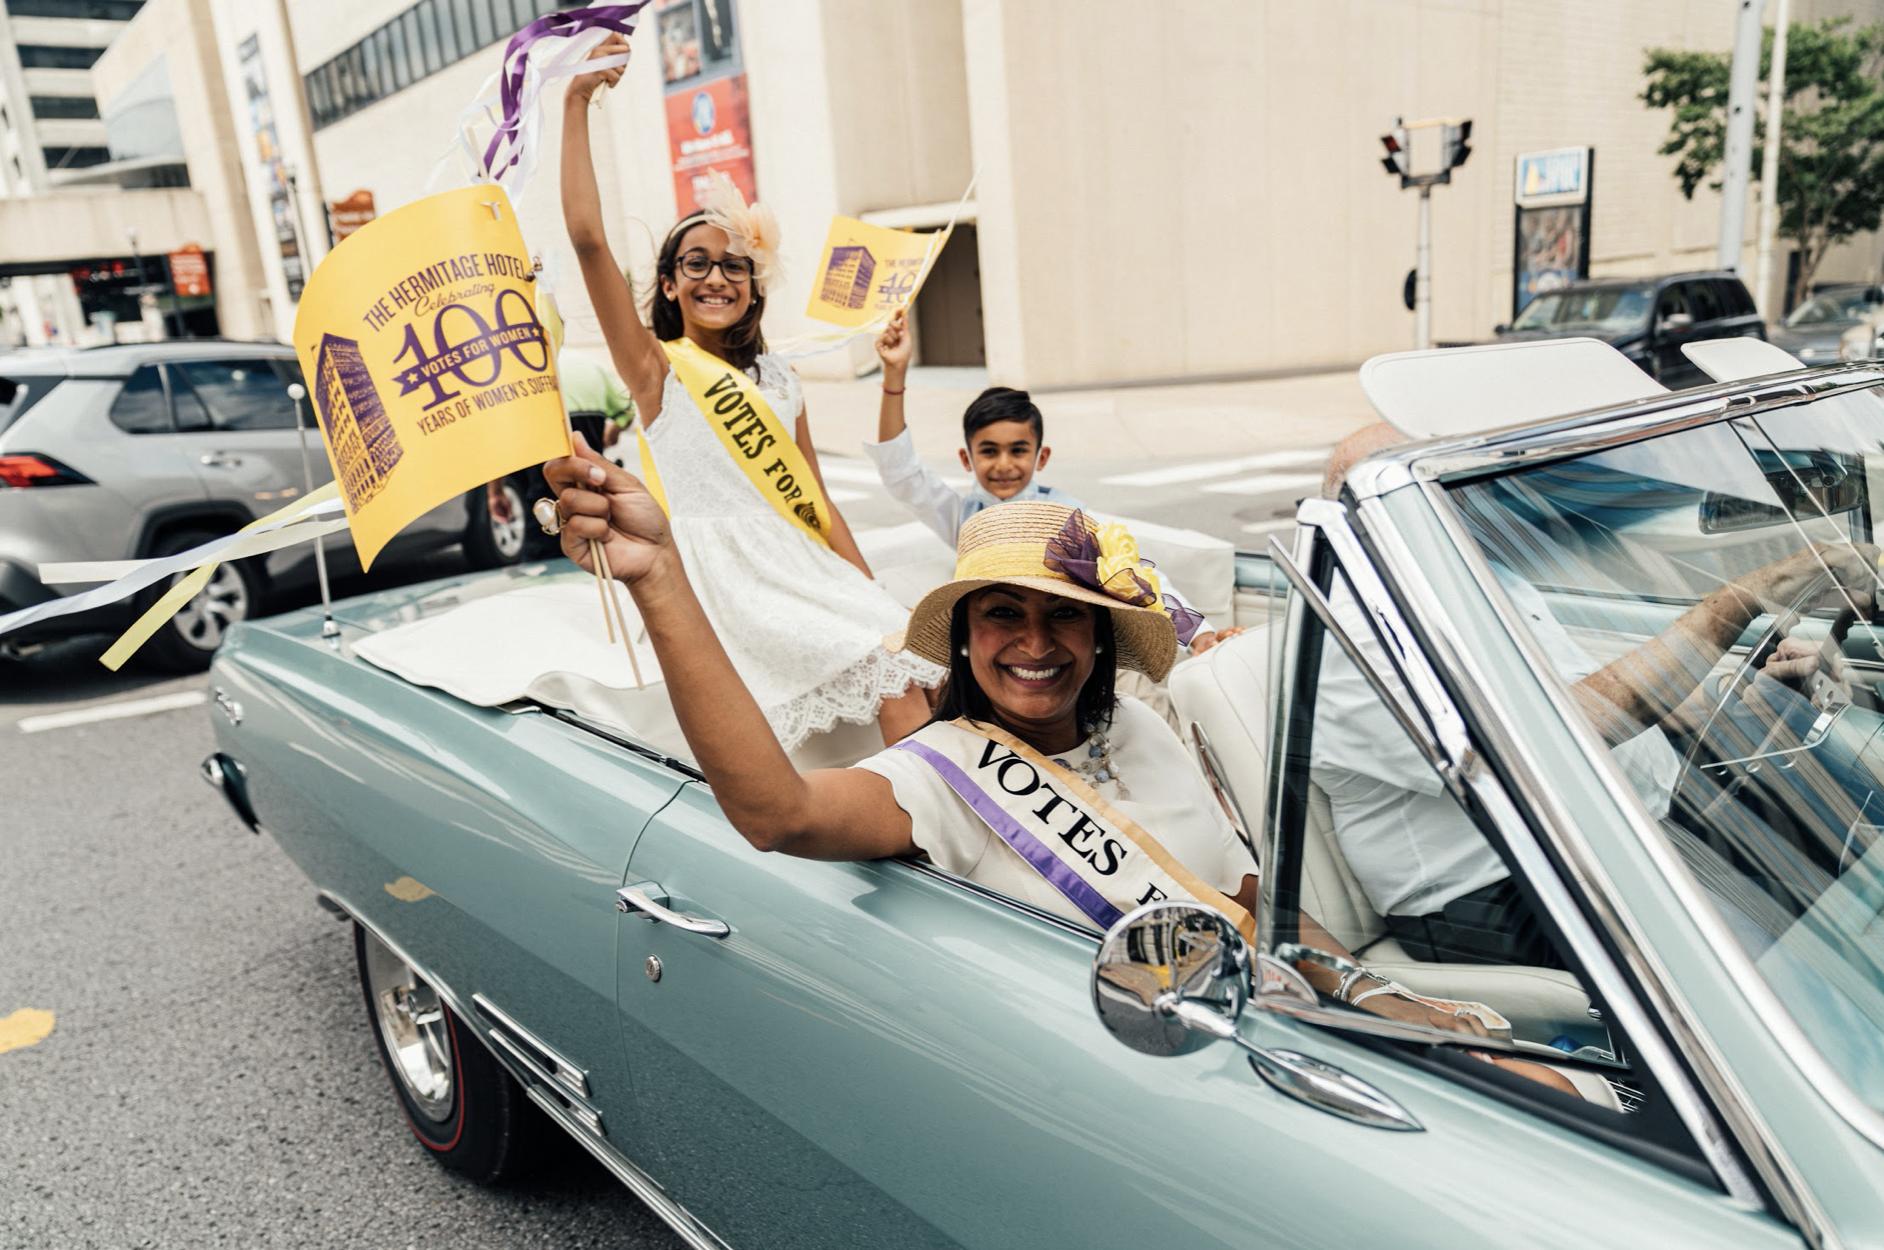 Nashville, Tenn., Aug. 18 - A day of celebration as the 19th Amendment hits the 100 mark. (Photo: Alex Kent)